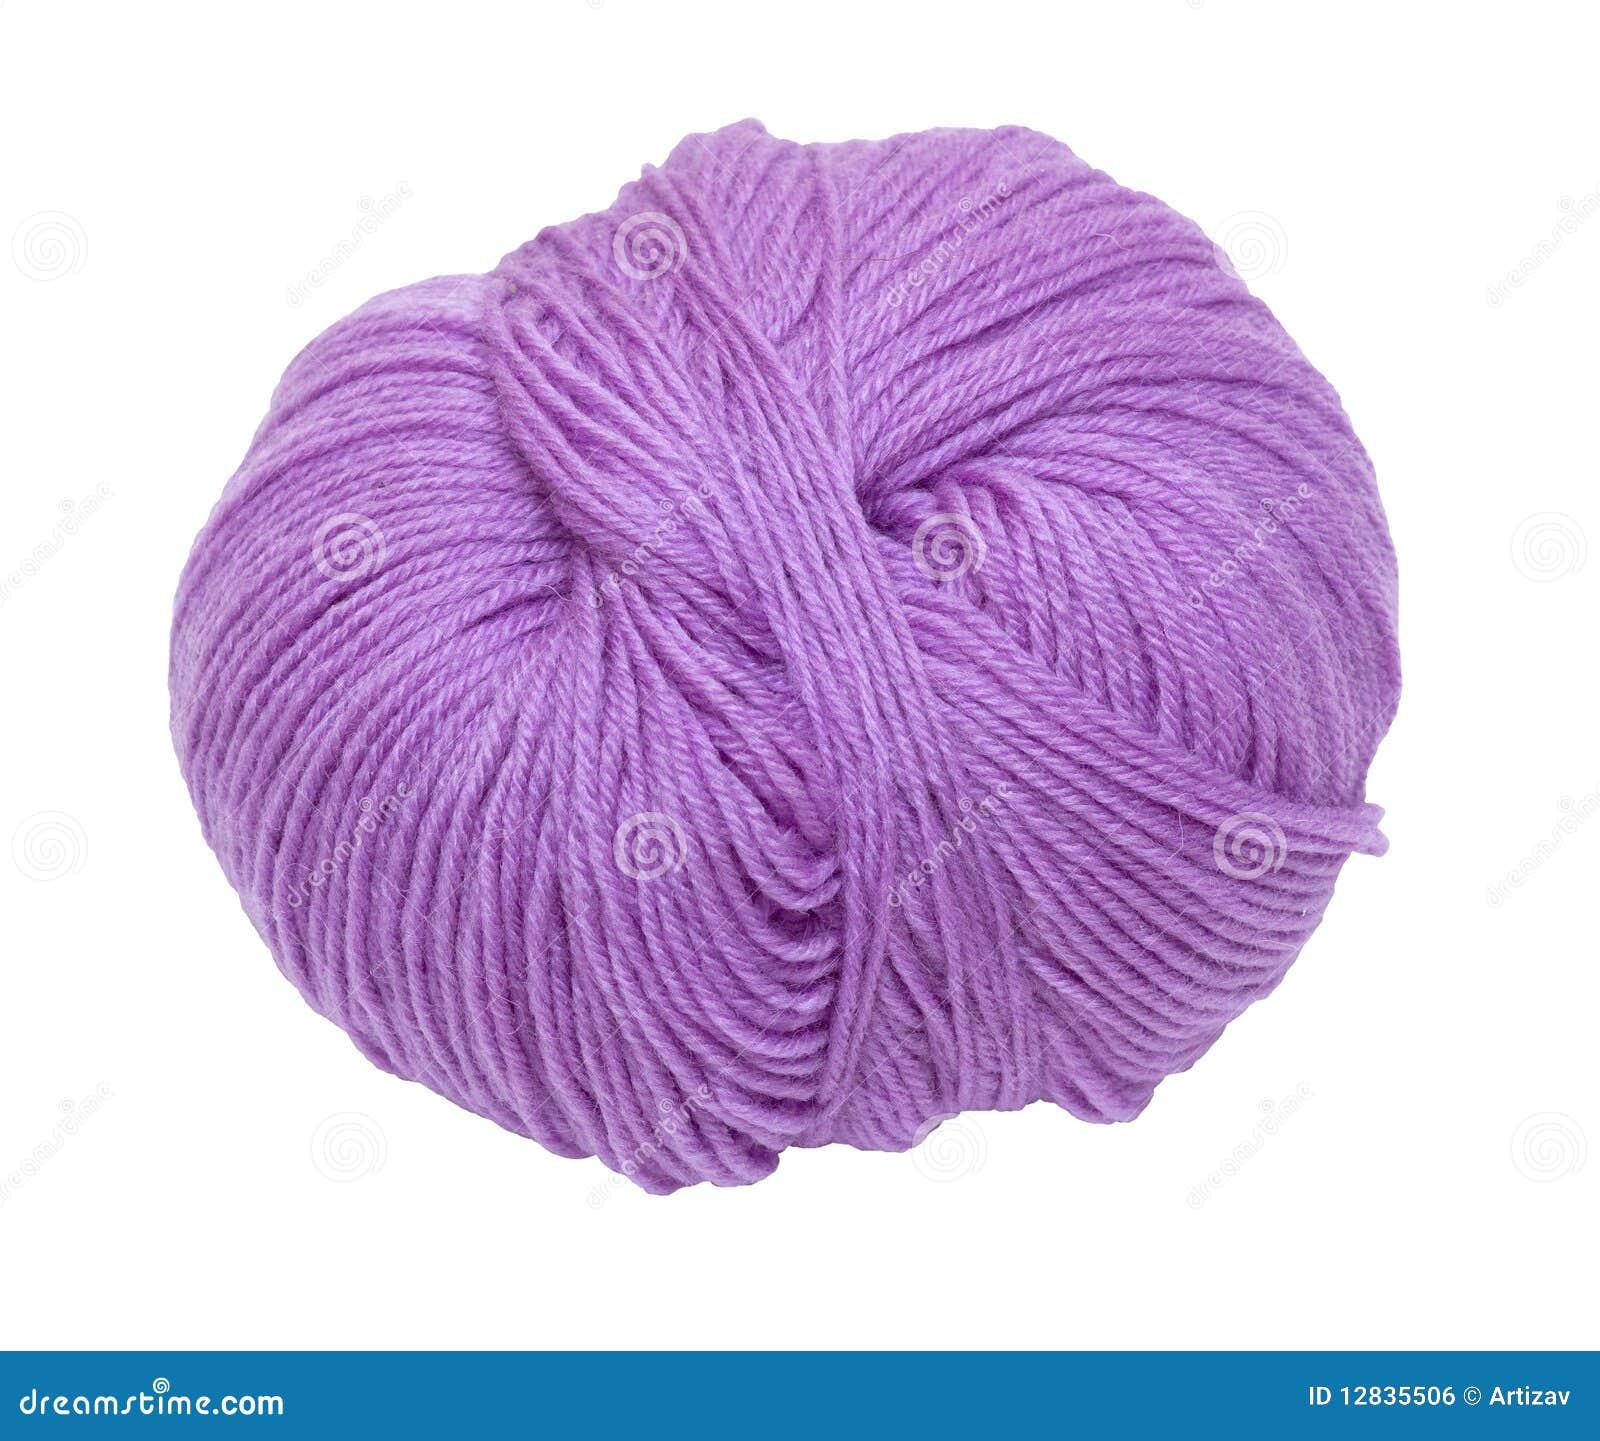 ball of yarn - photo #44